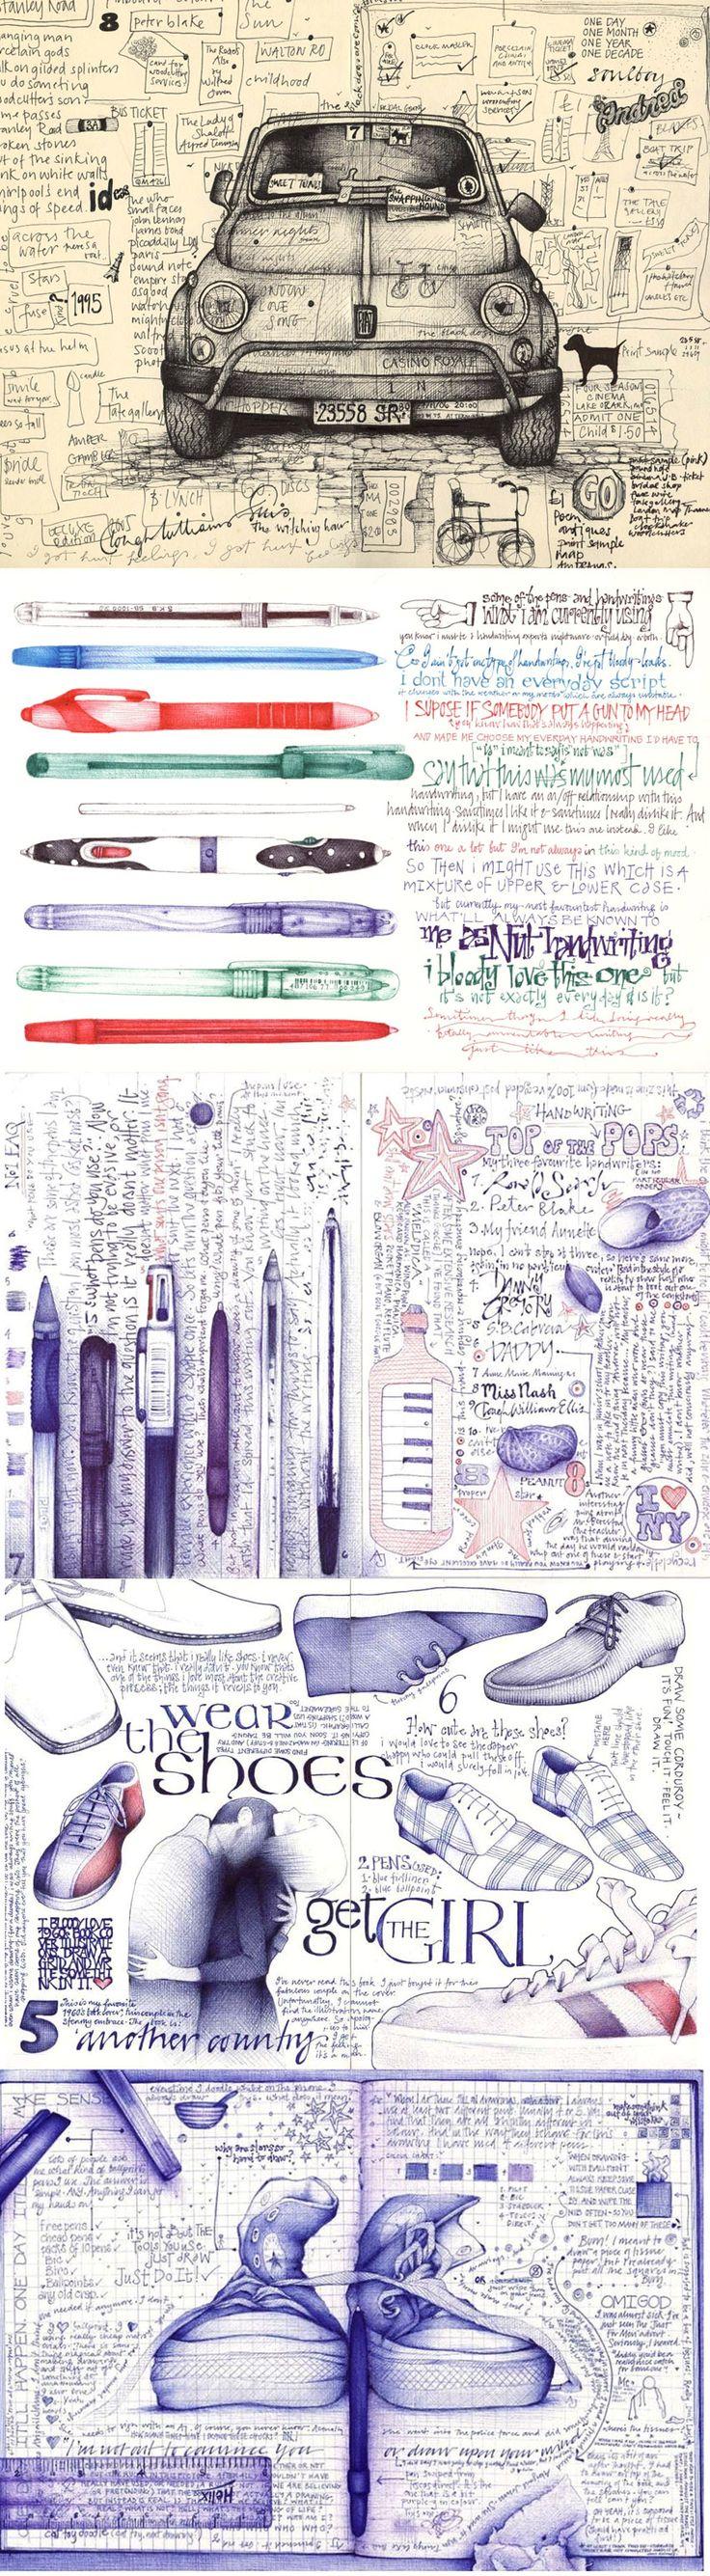 Sketchezzz... Andrea Joseph http://andreajoseph24.blogspot.ca/ @AndreaJoseph #Sketch #Creative #SketchPad